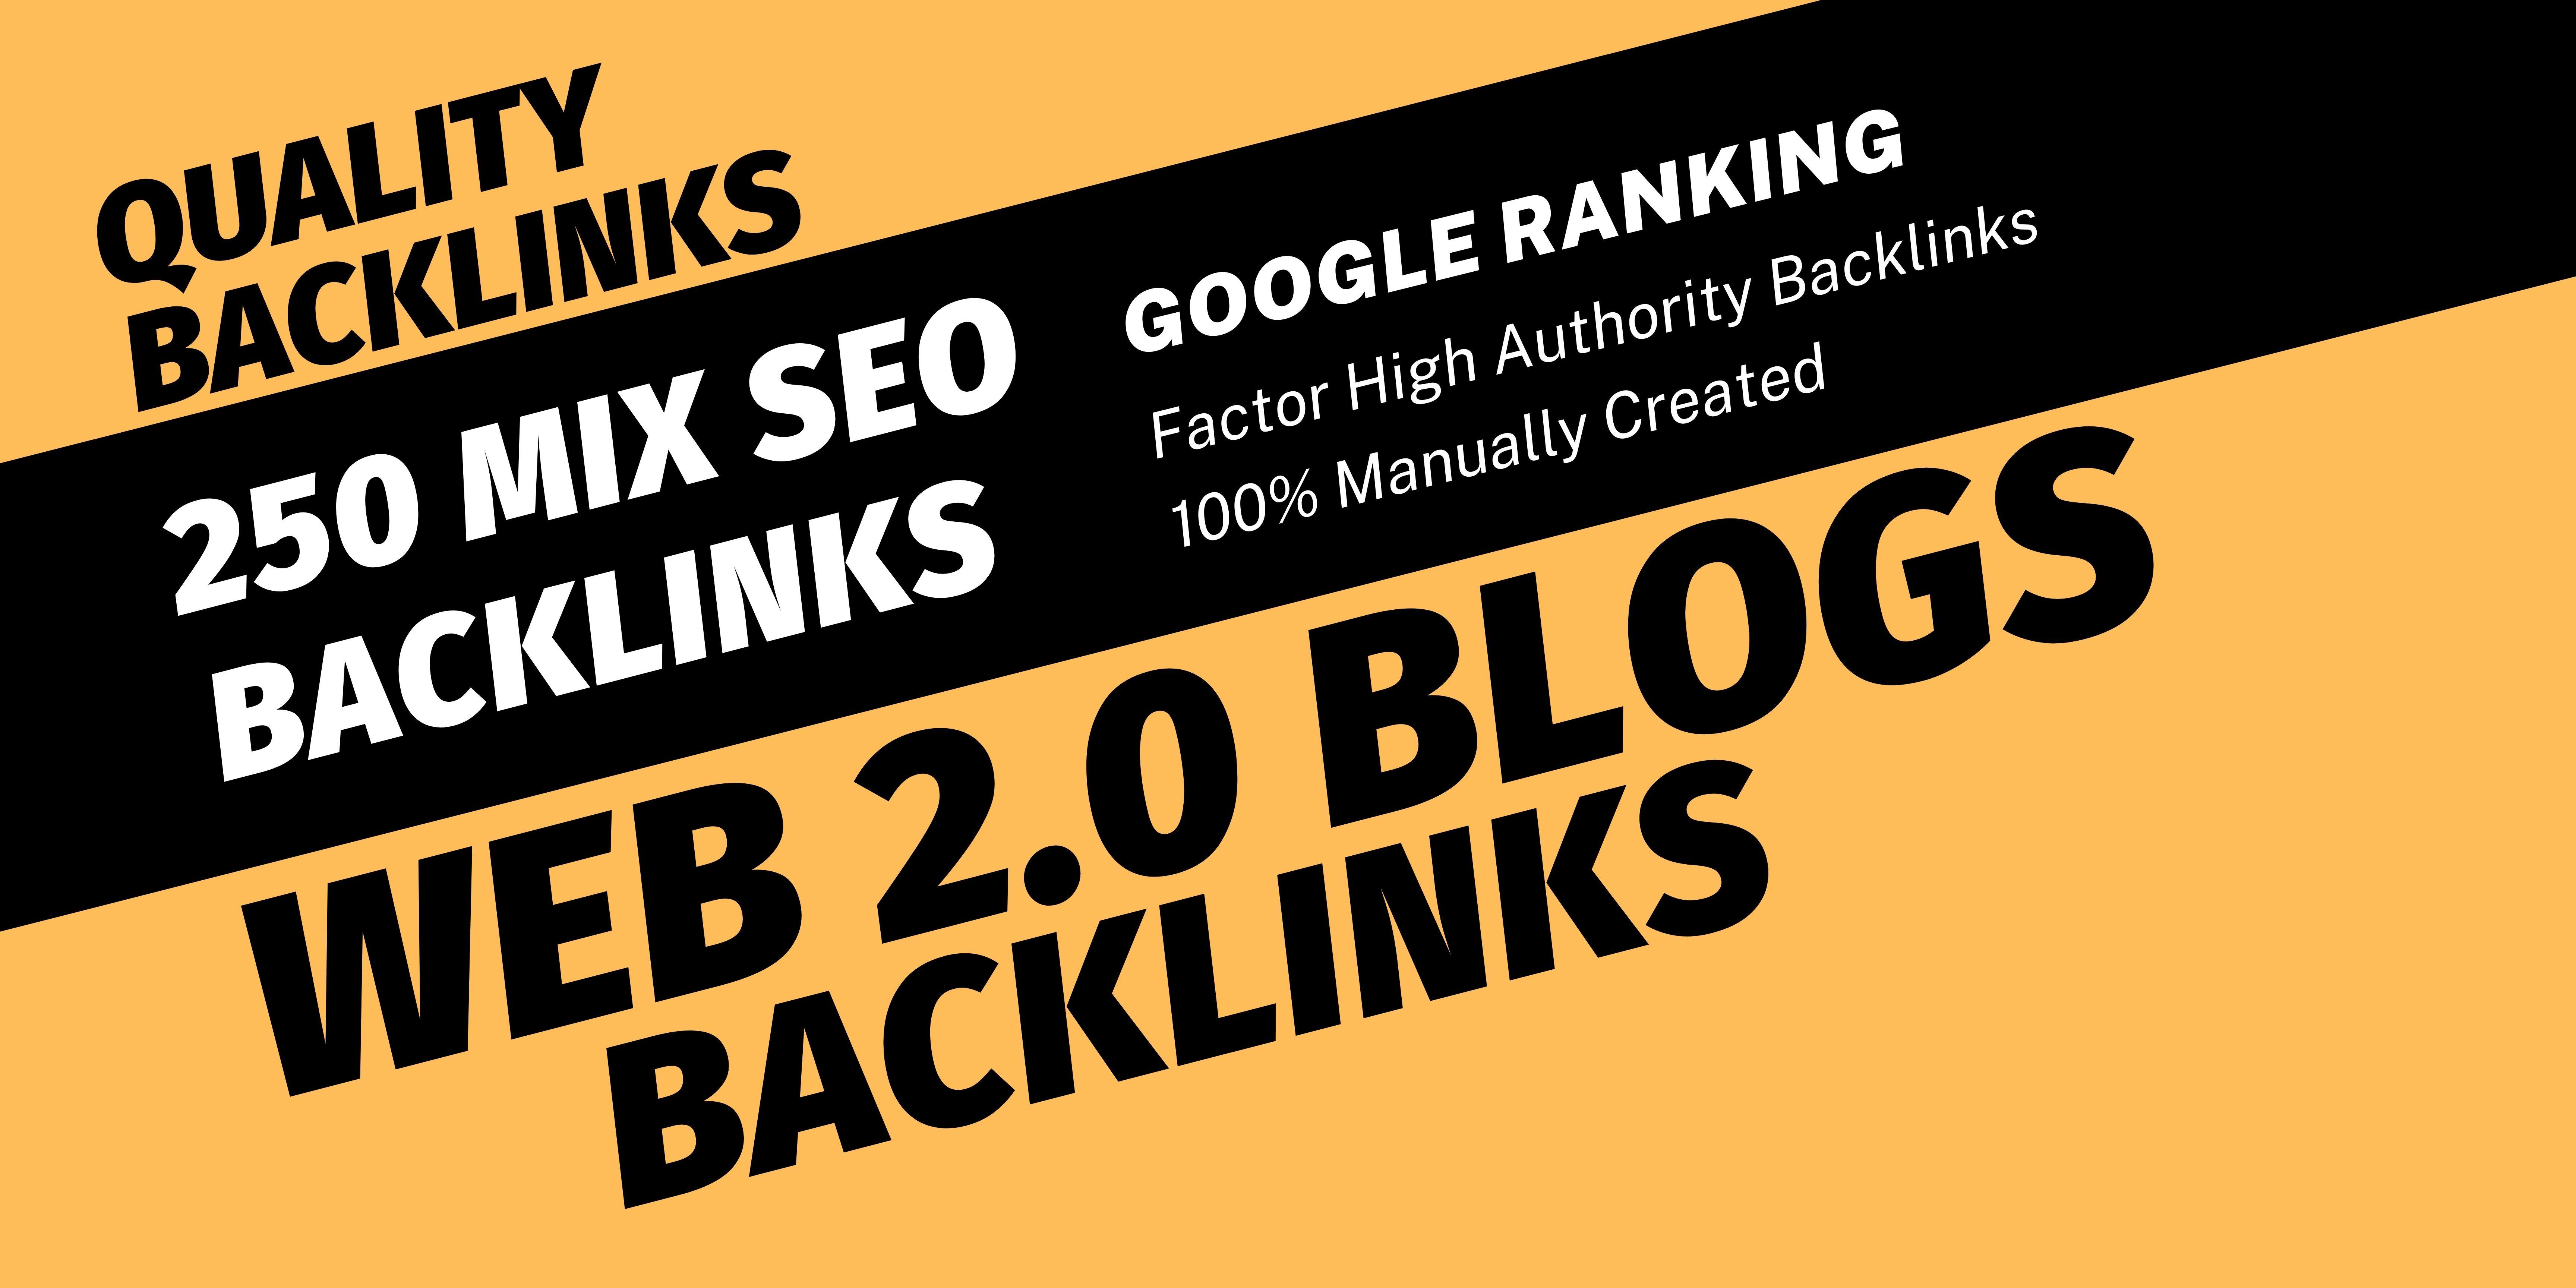 50 Web 2.0 Buffer Blogs and 200 Do-follow Profile Backlinks